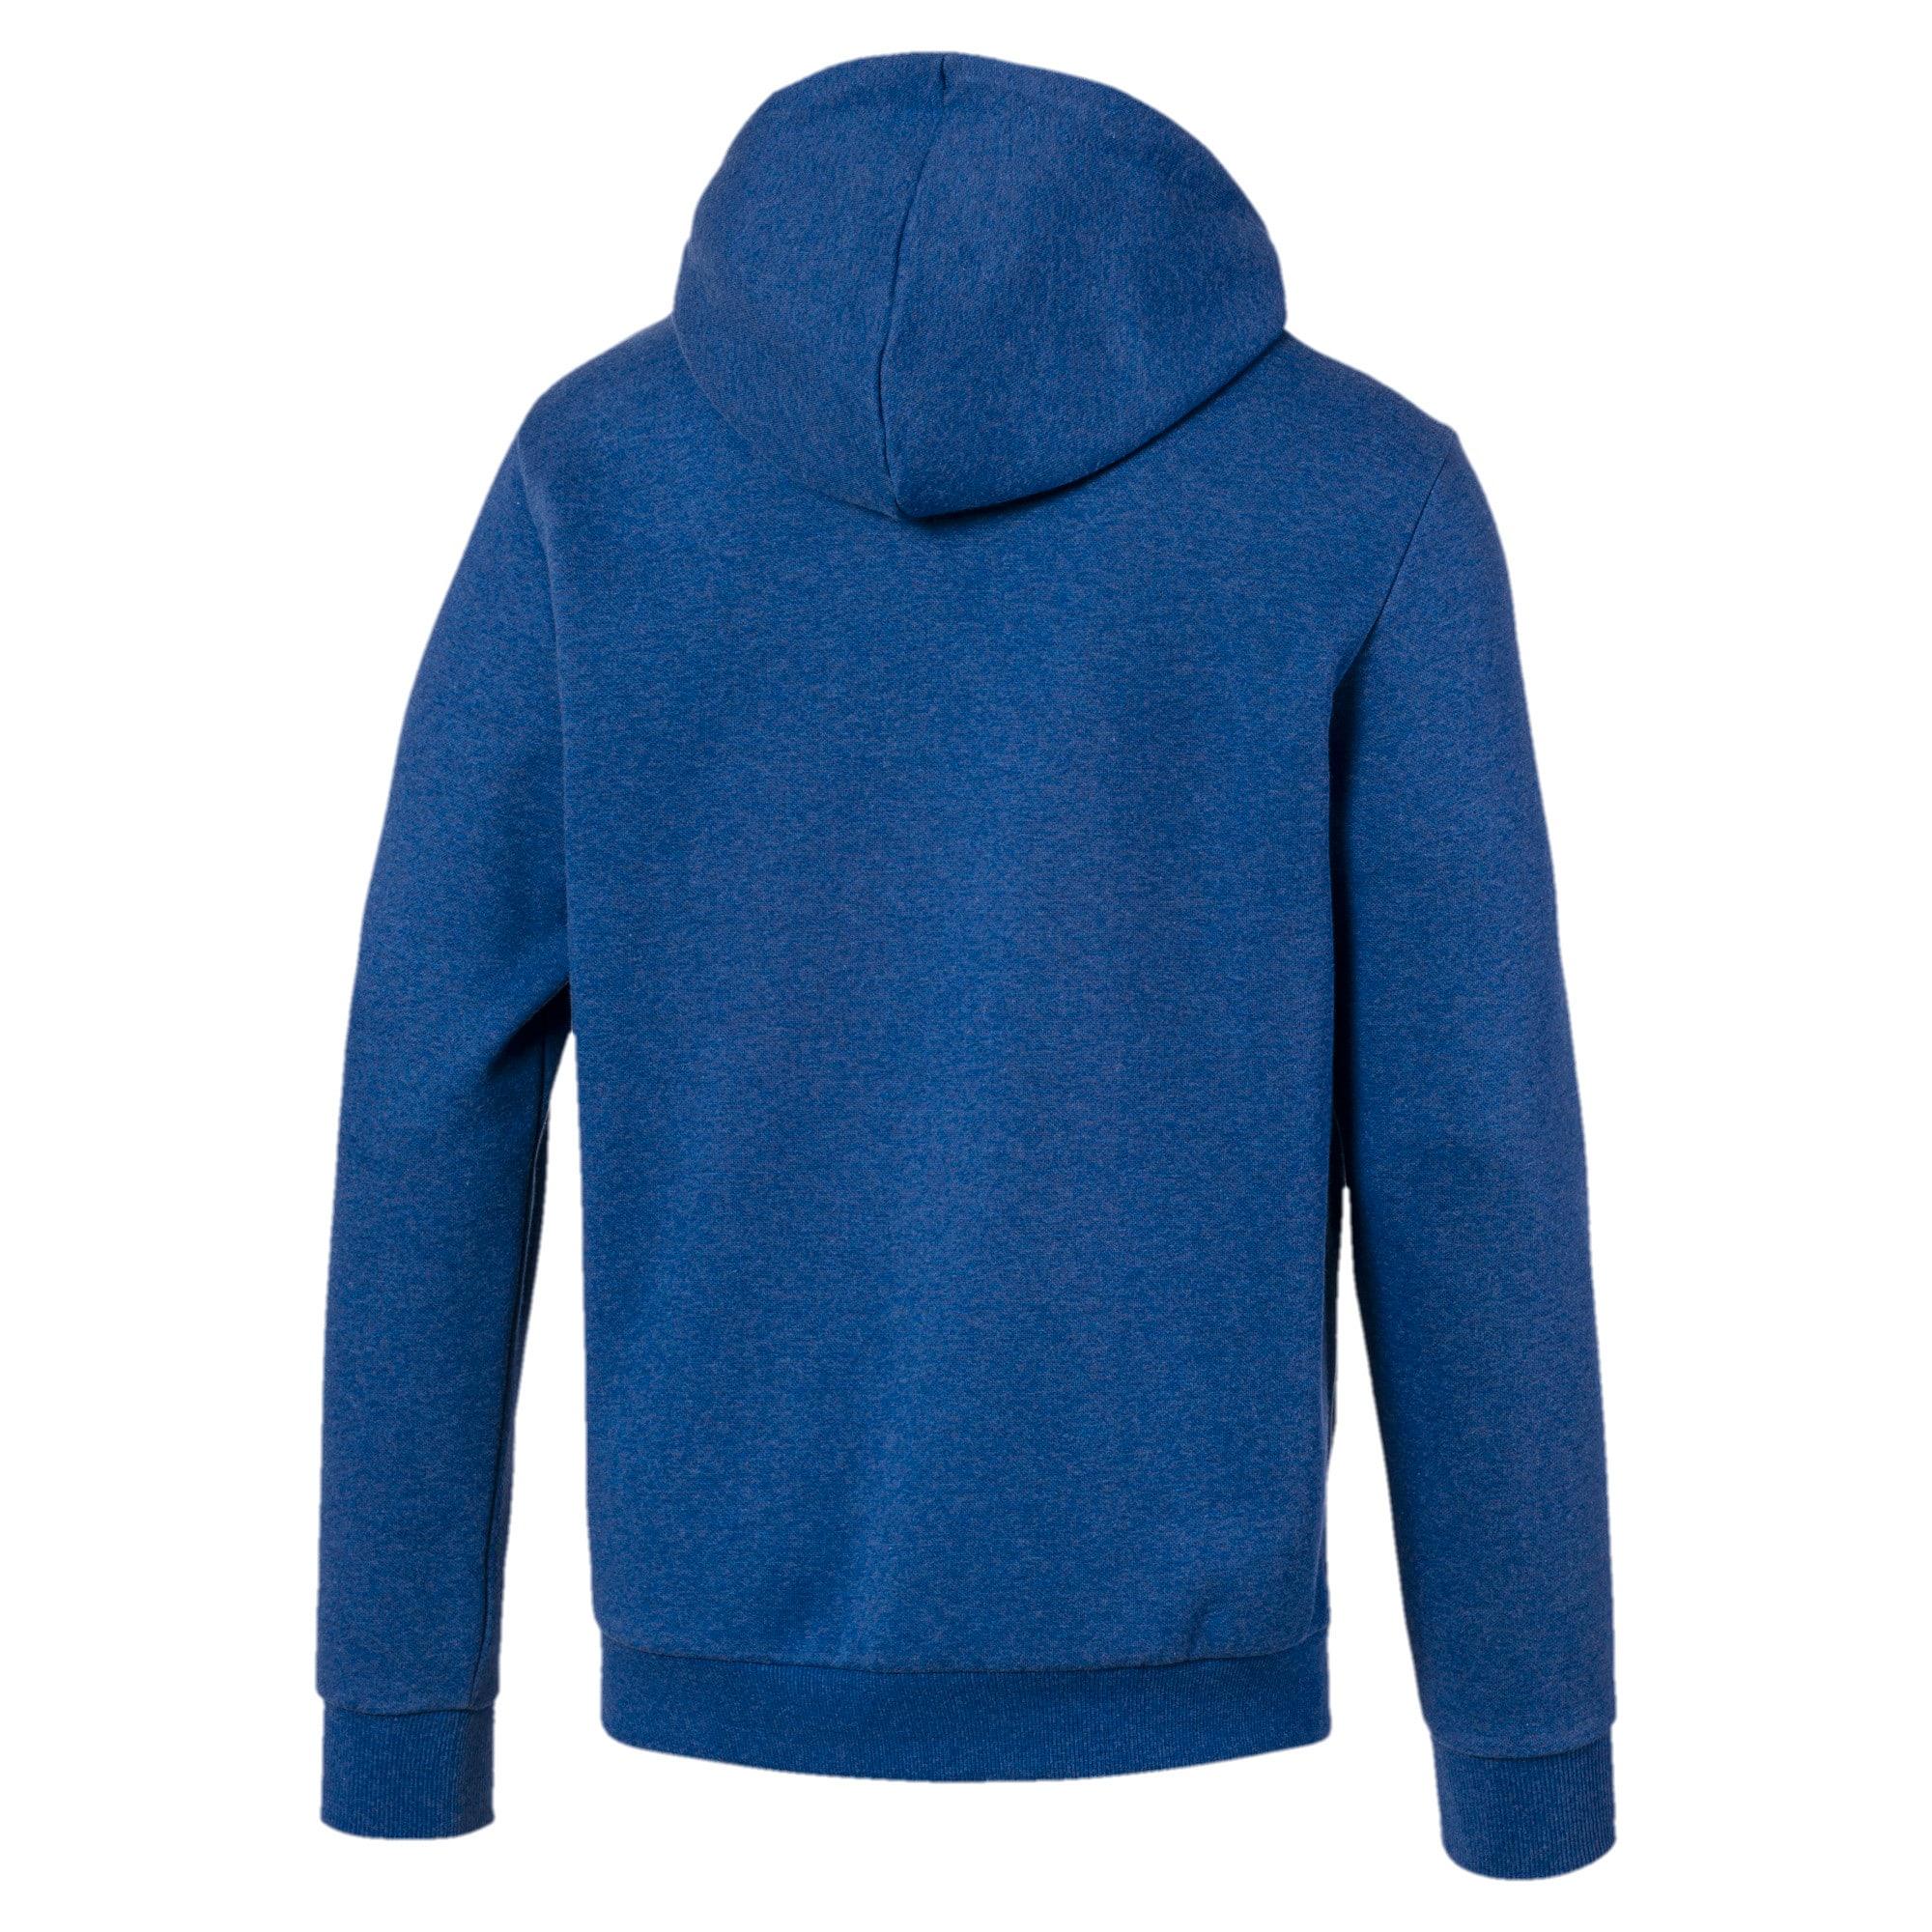 Thumbnail 5 of Essentials Fleece Men's Hoodie, Galaxy Blue Heather, medium